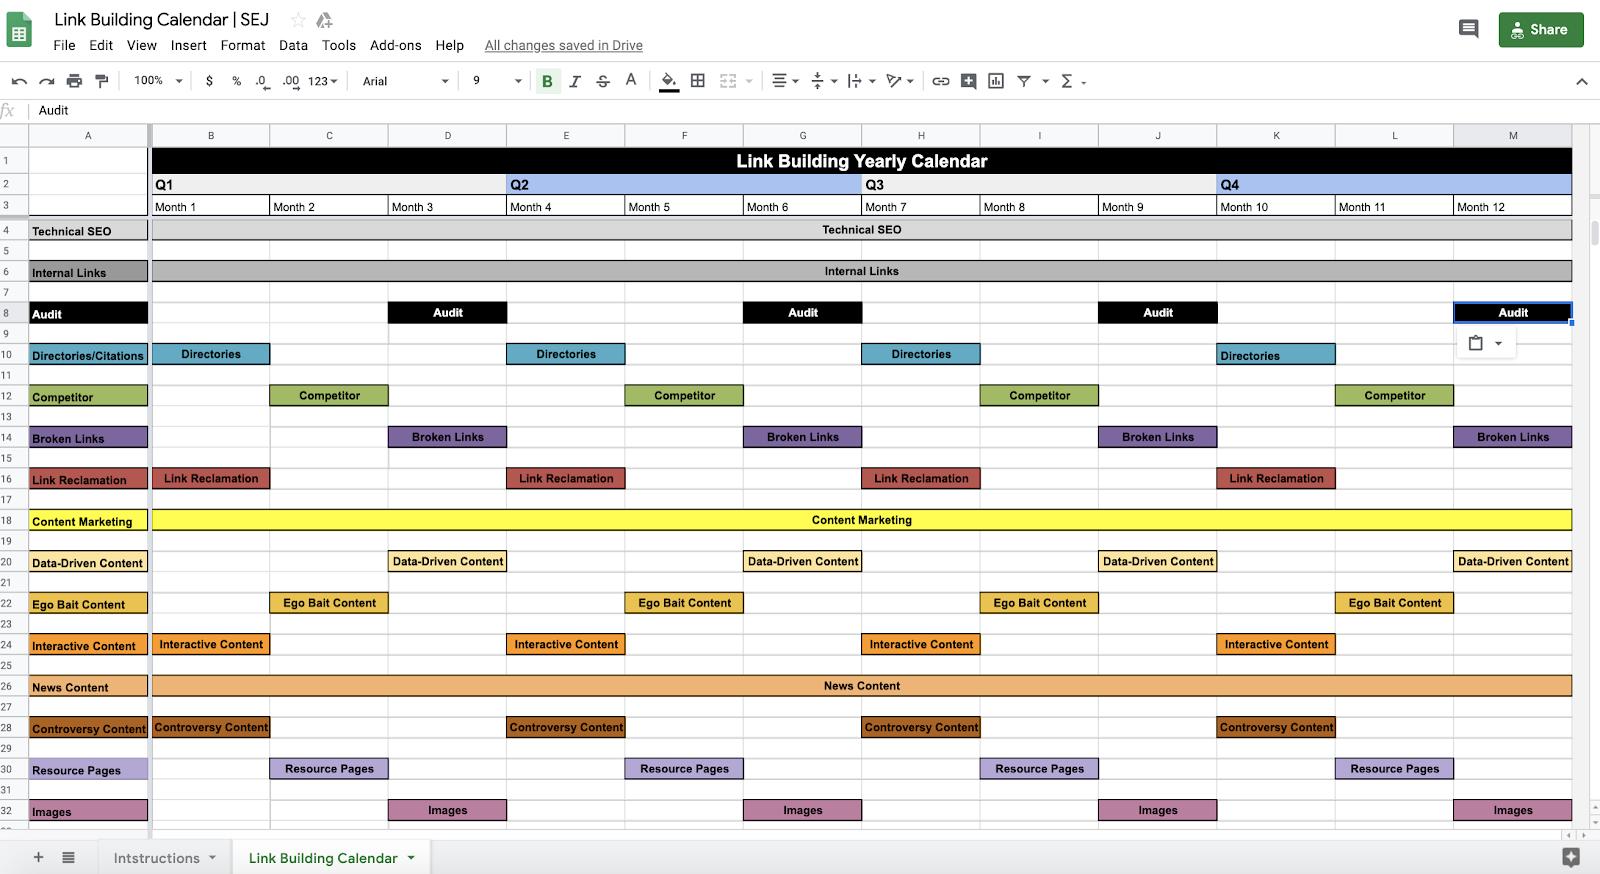 Link Building Calendar